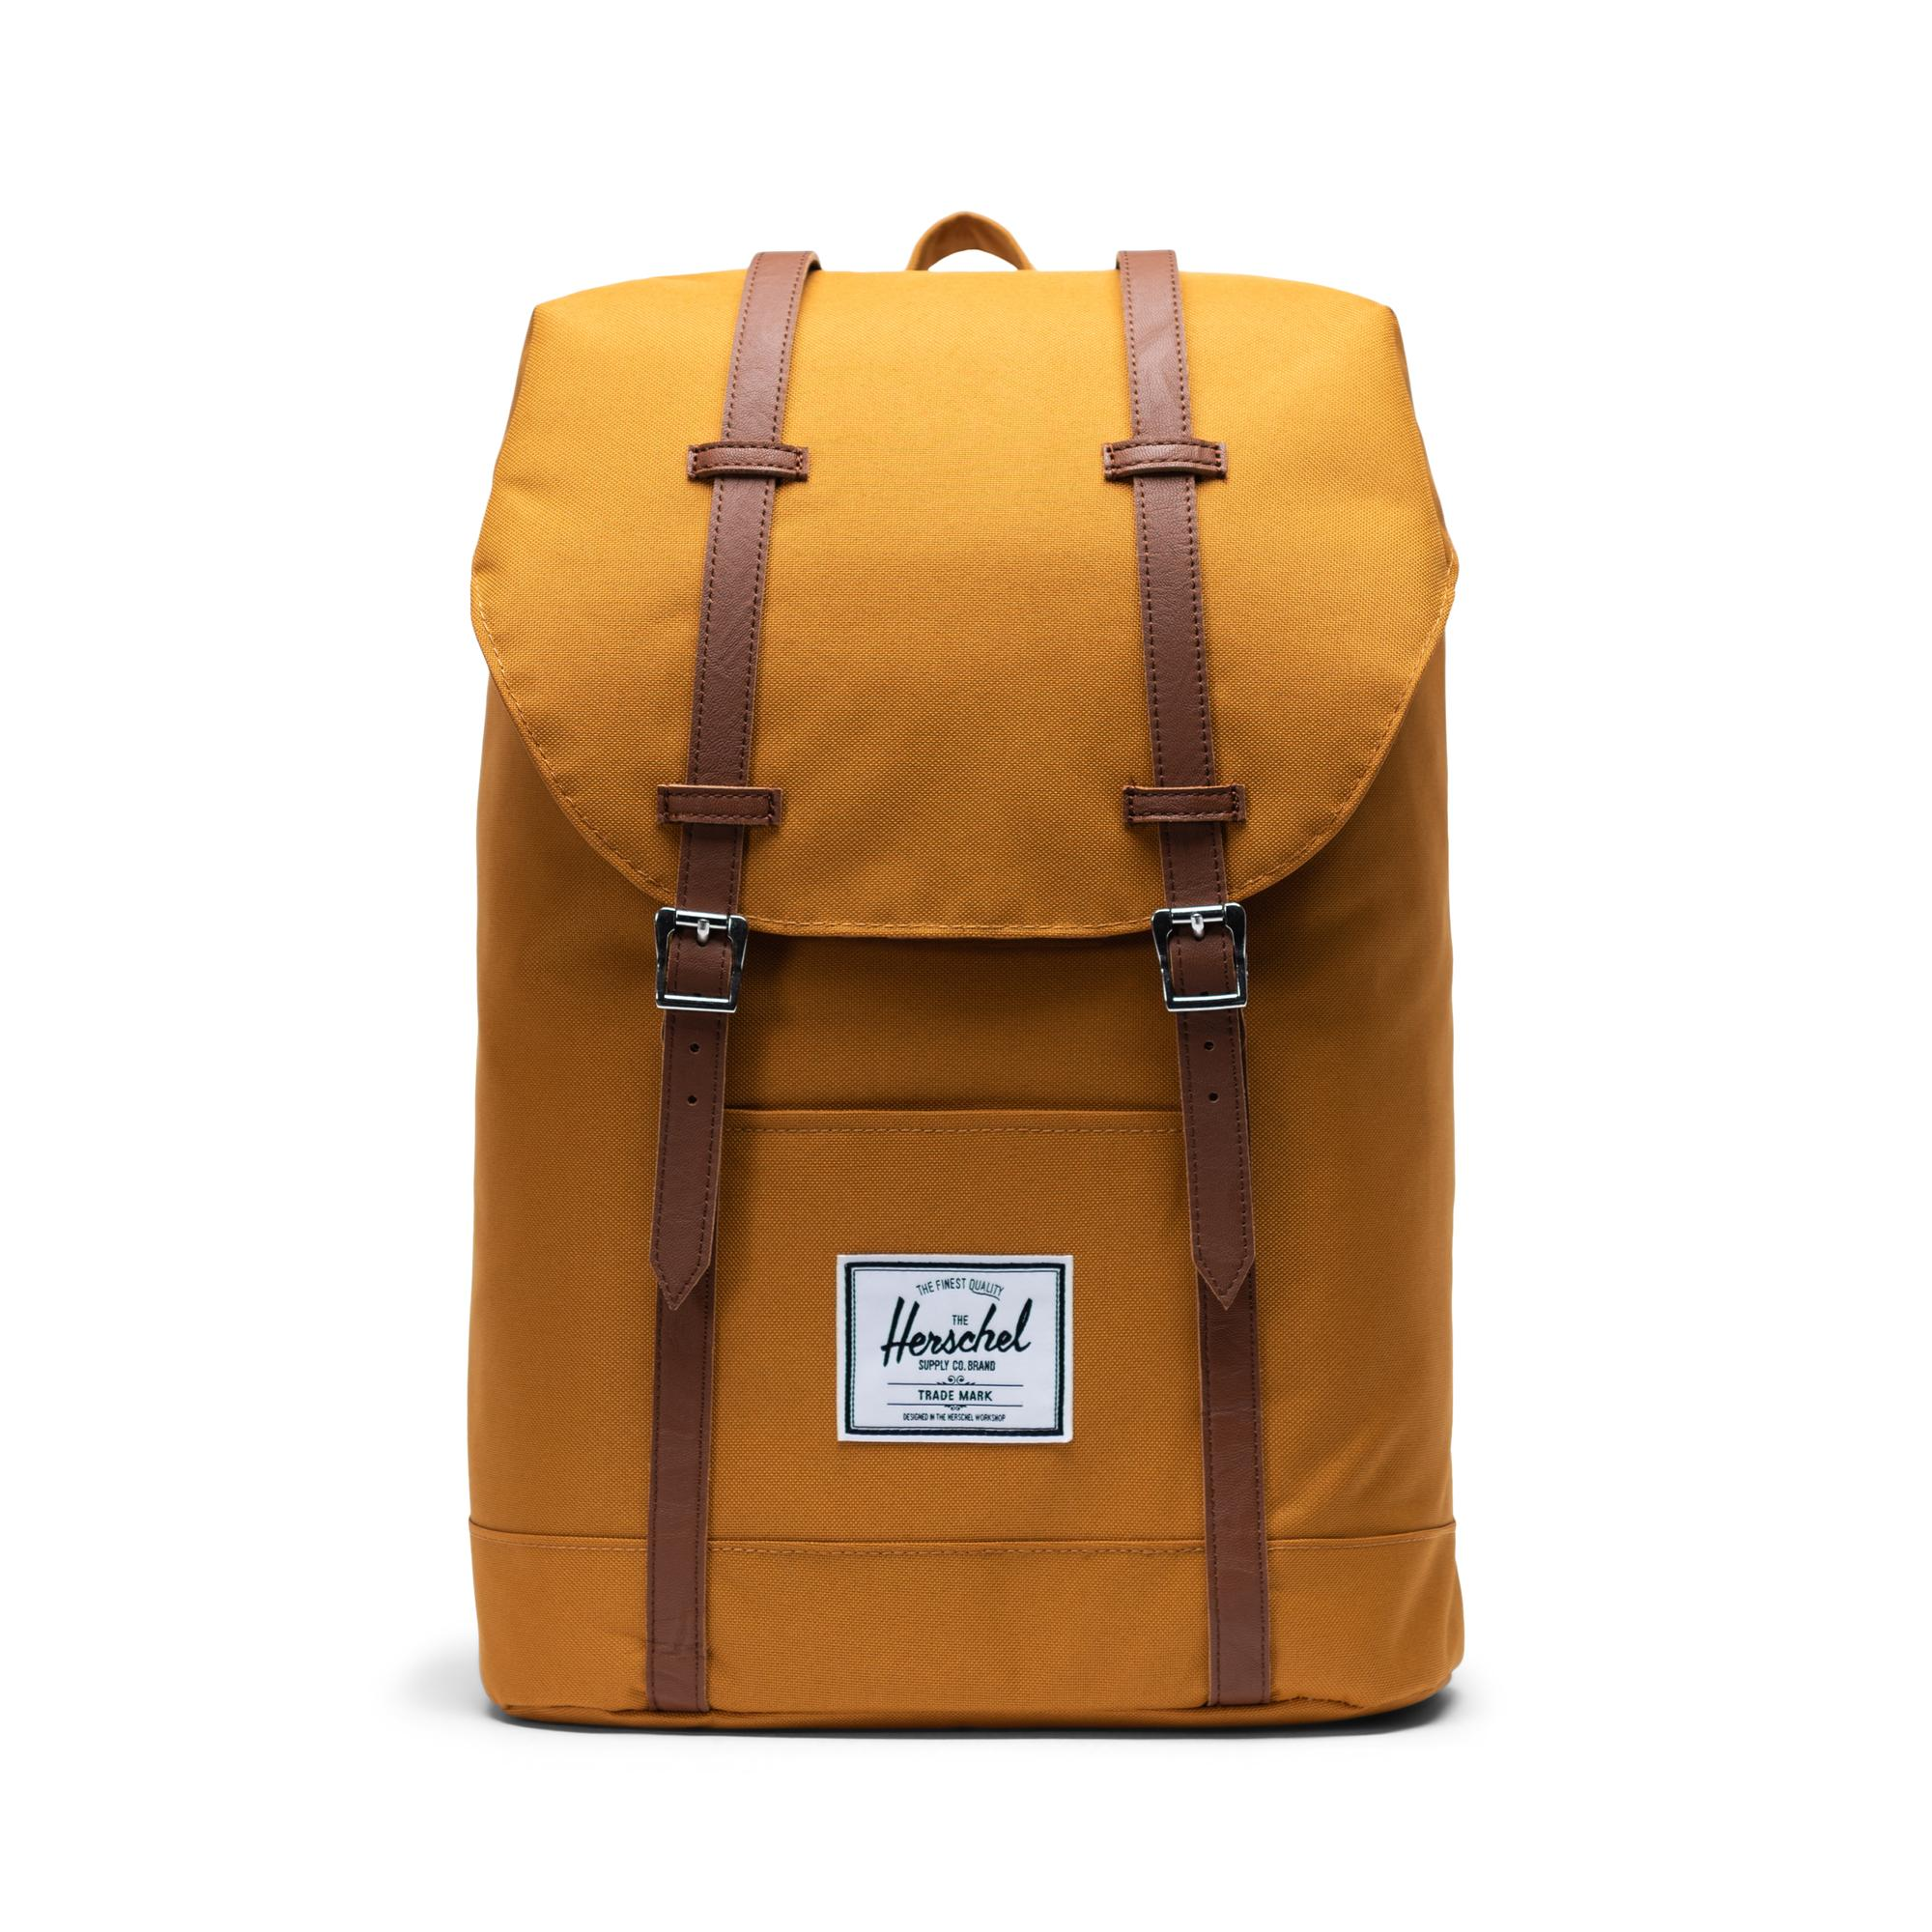 "10 Orange 4.7/""x6.7/"" Mailing Postage Postal Mail Bags"